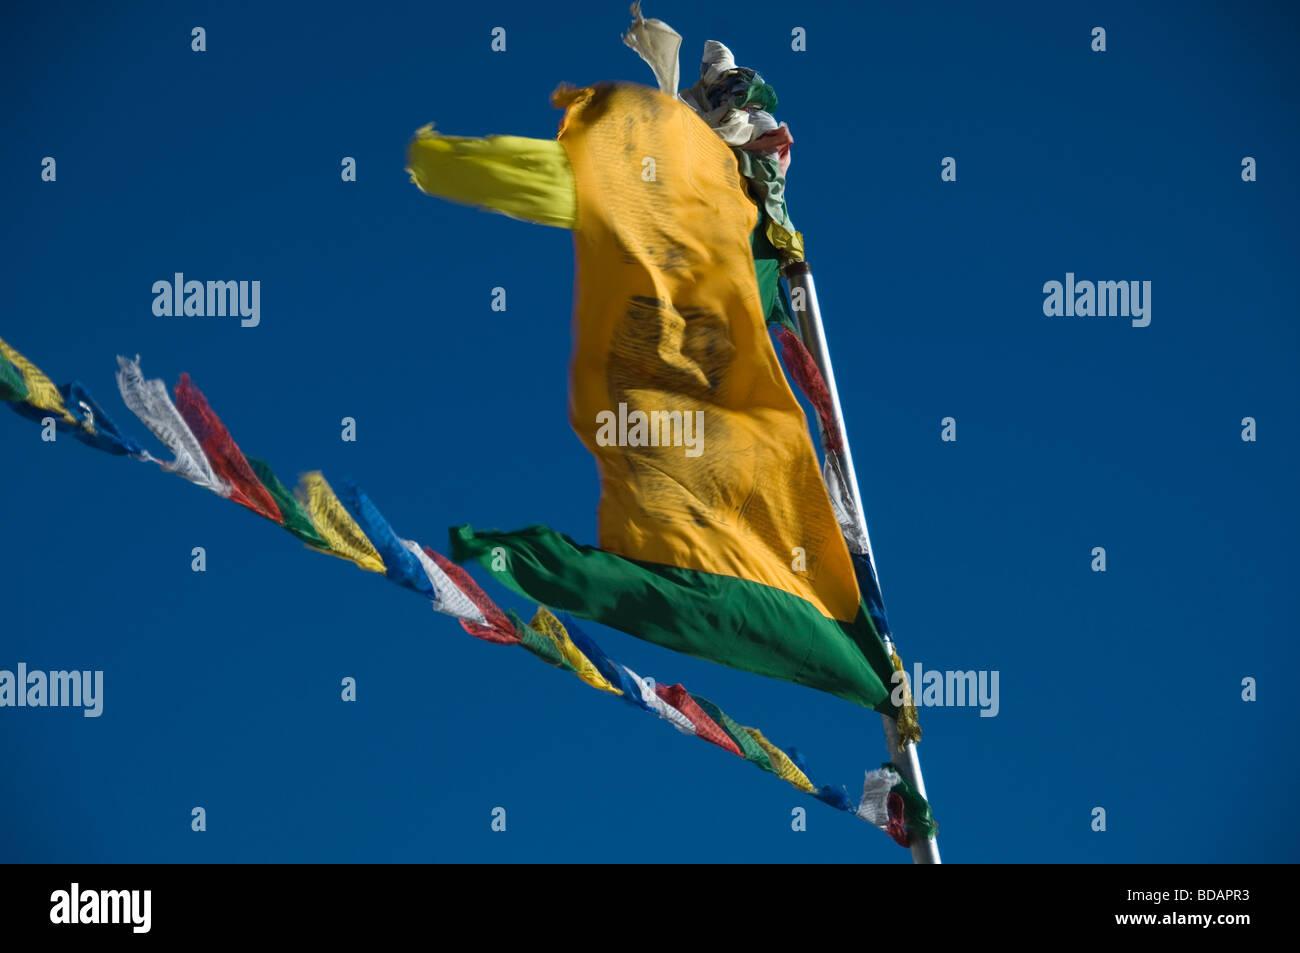 Prayer flags fluttering against the blue sky, Khardung La Pass, Ladakh, Jammu and Kashmir, India - Stock Image